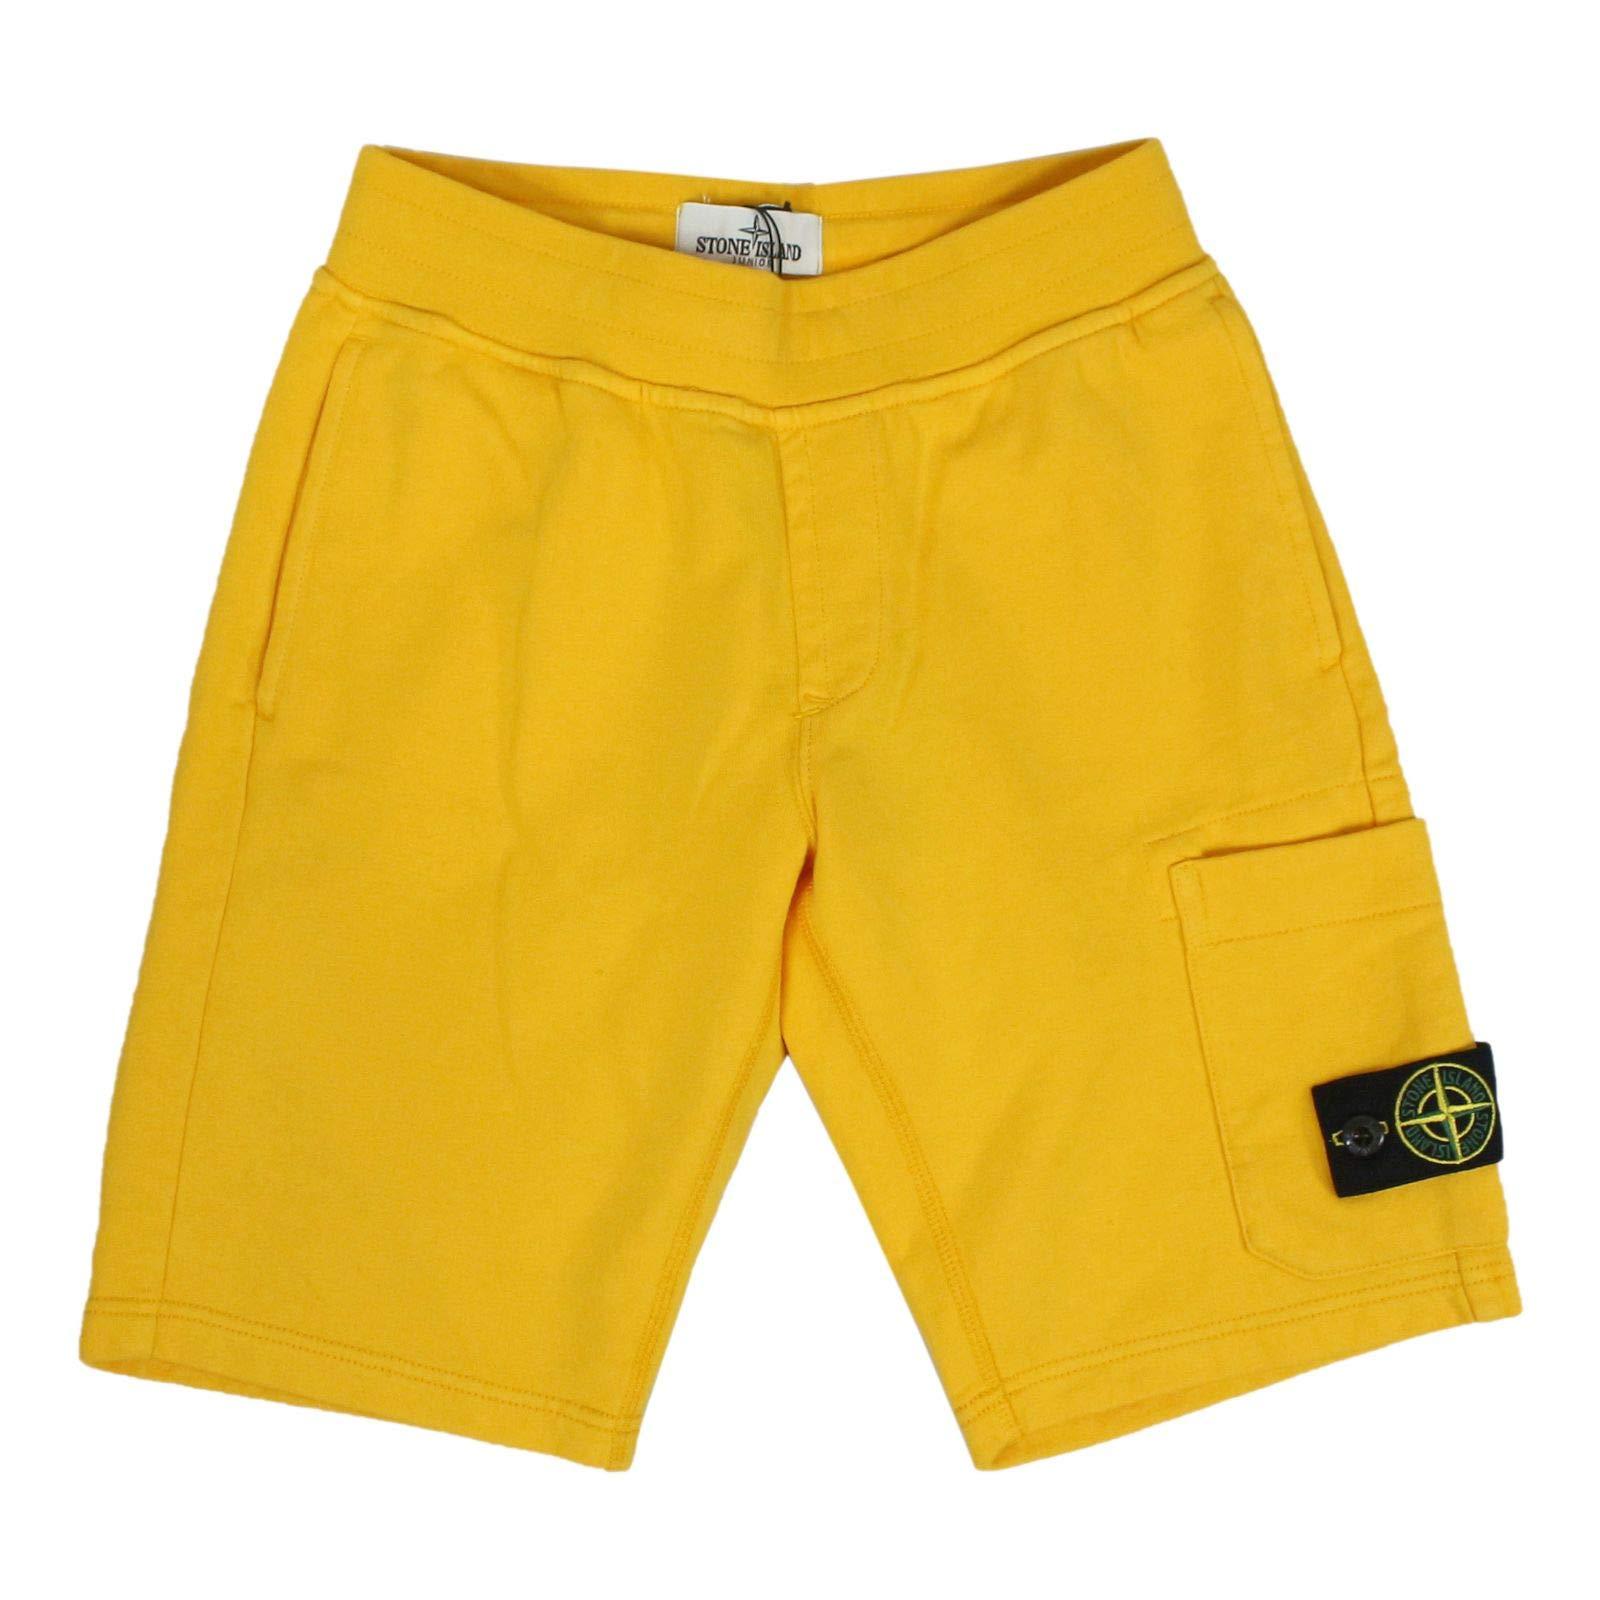 Stone Island Boys 701660740V0030 Yellow Cotton Shorts